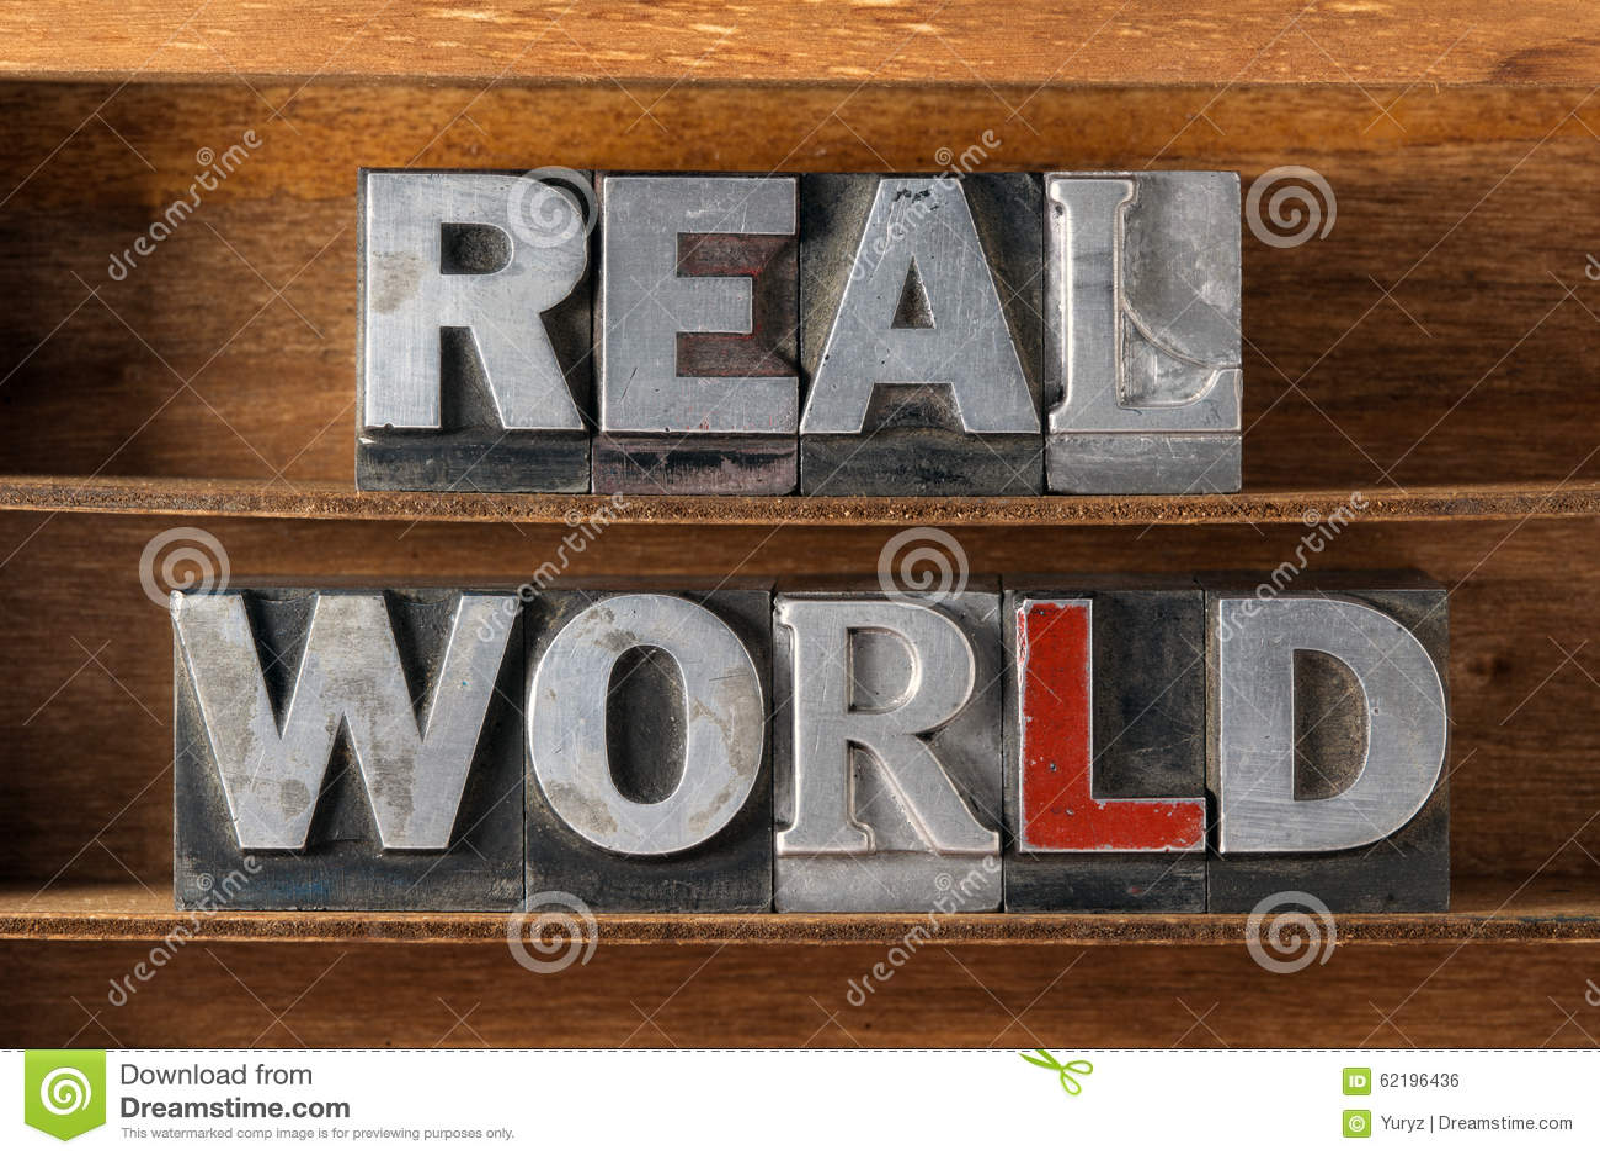 Bandeja do mundo real